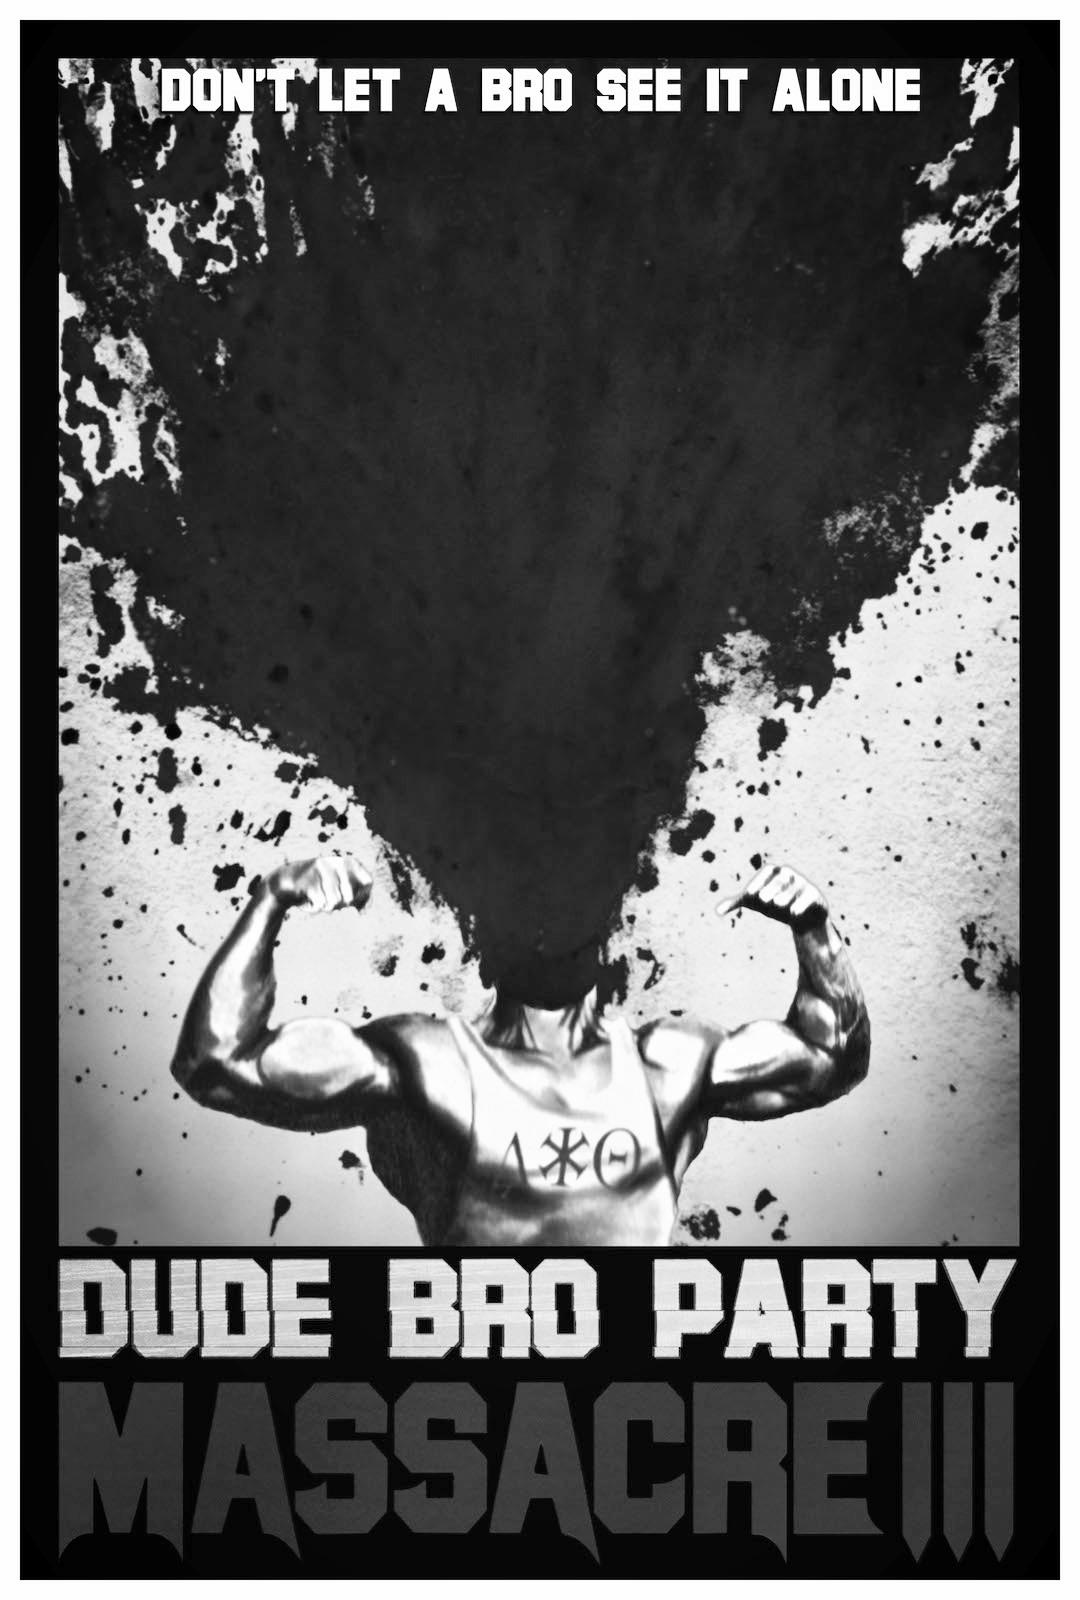 Dude Bro Party Massacre 3.jpg